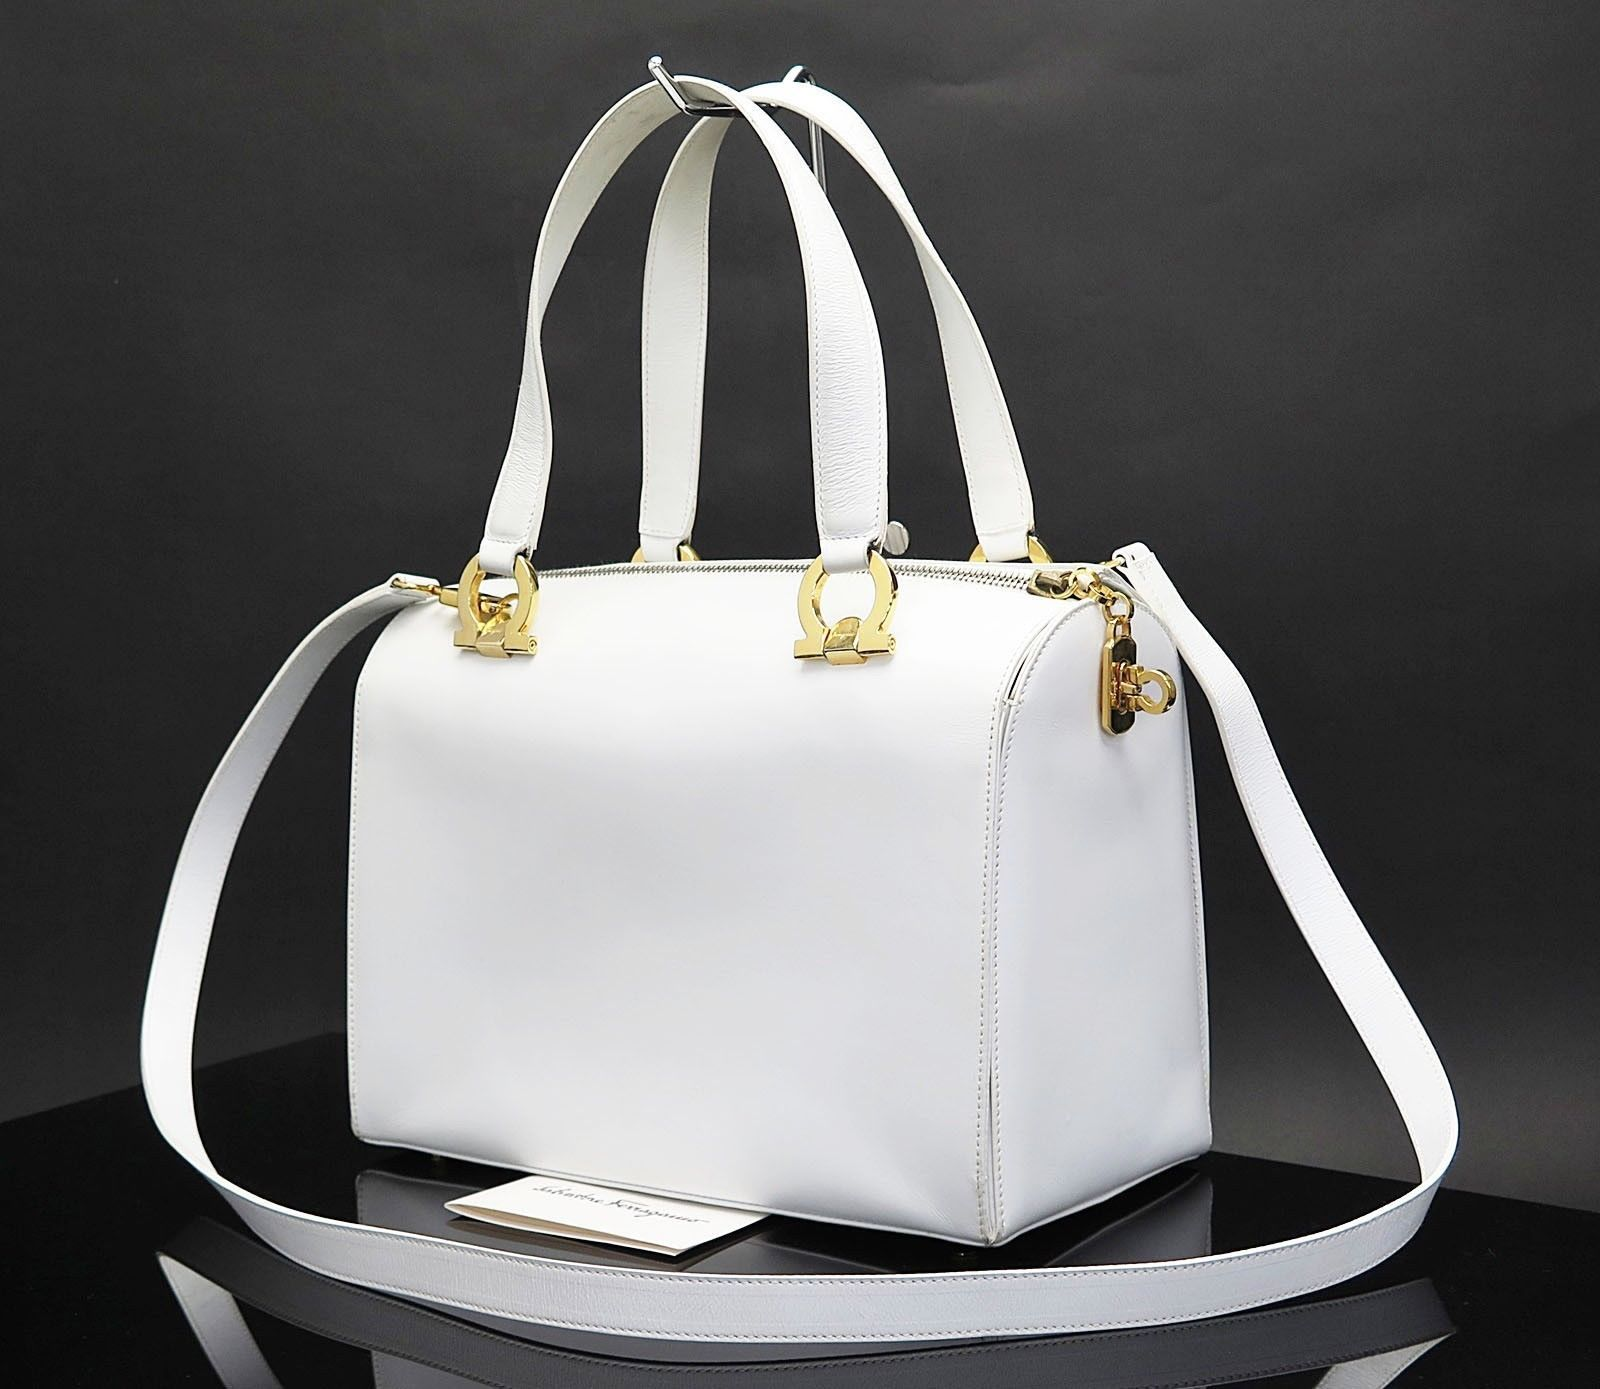 8c8424bdee57 Auth SALVATORE FERRAGAMO Gancini White Leather 2-Way Shoulder Hand Bag   27583